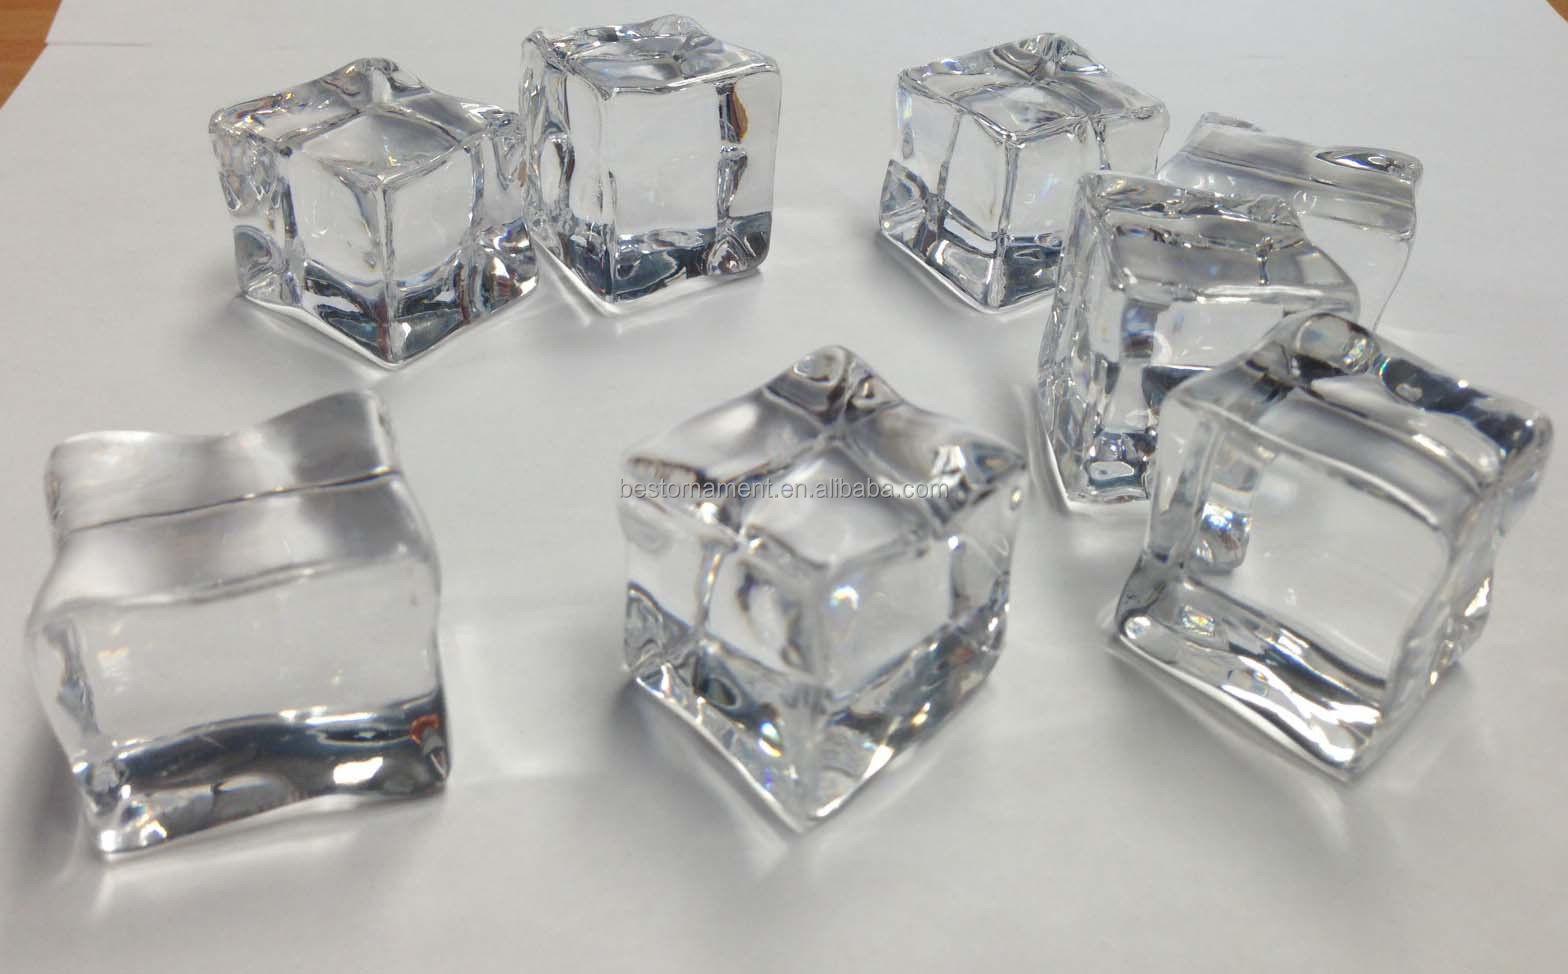 Acrylic ice cubes buy plastic clear